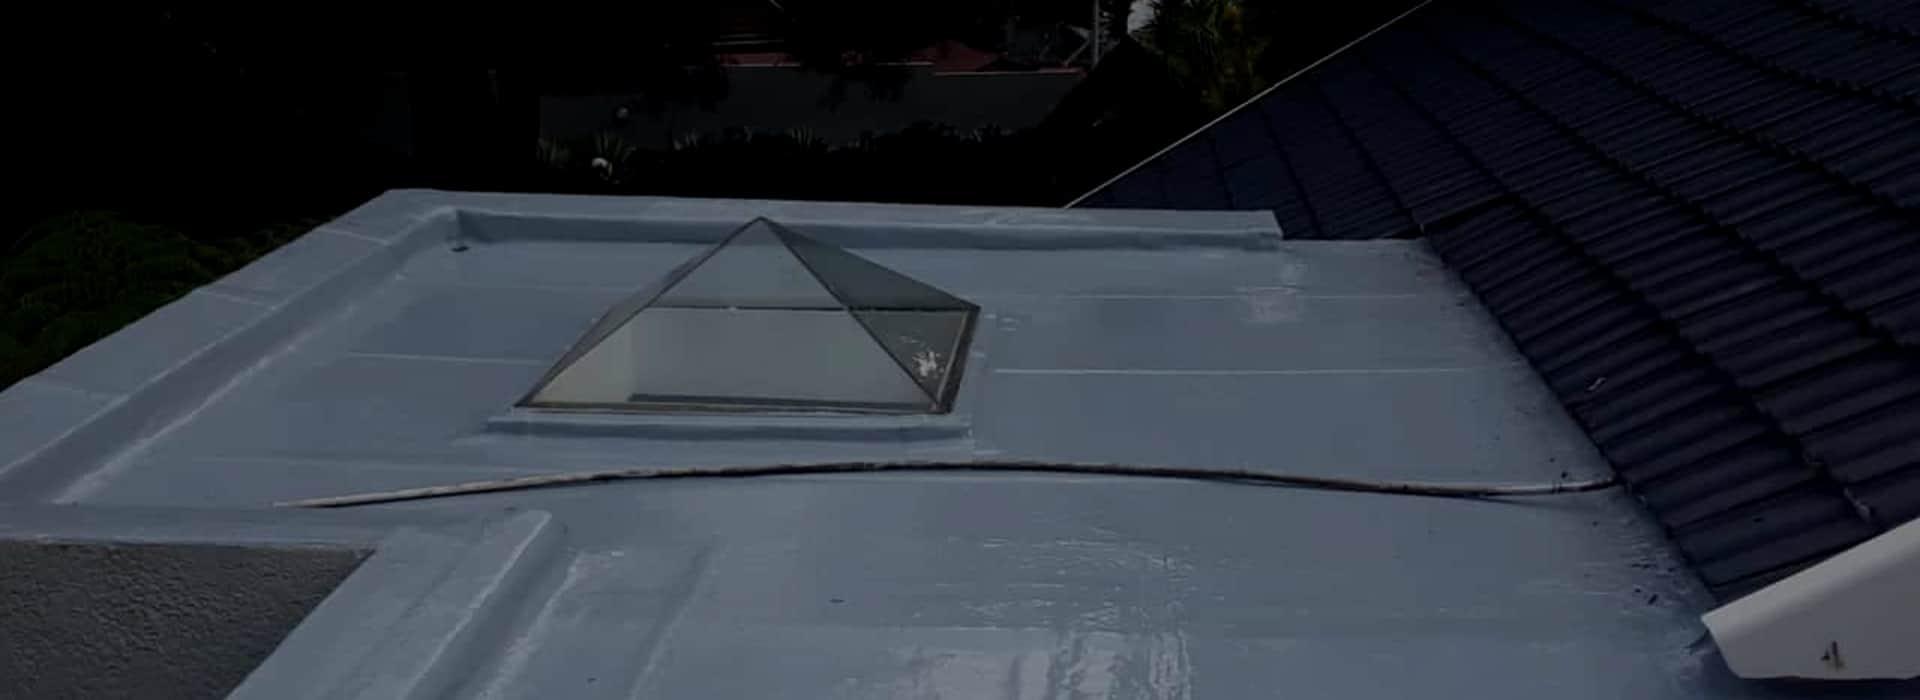 Visible Improvements Roof Waterproofing Randburg Sandton Johannesburg Bg 1